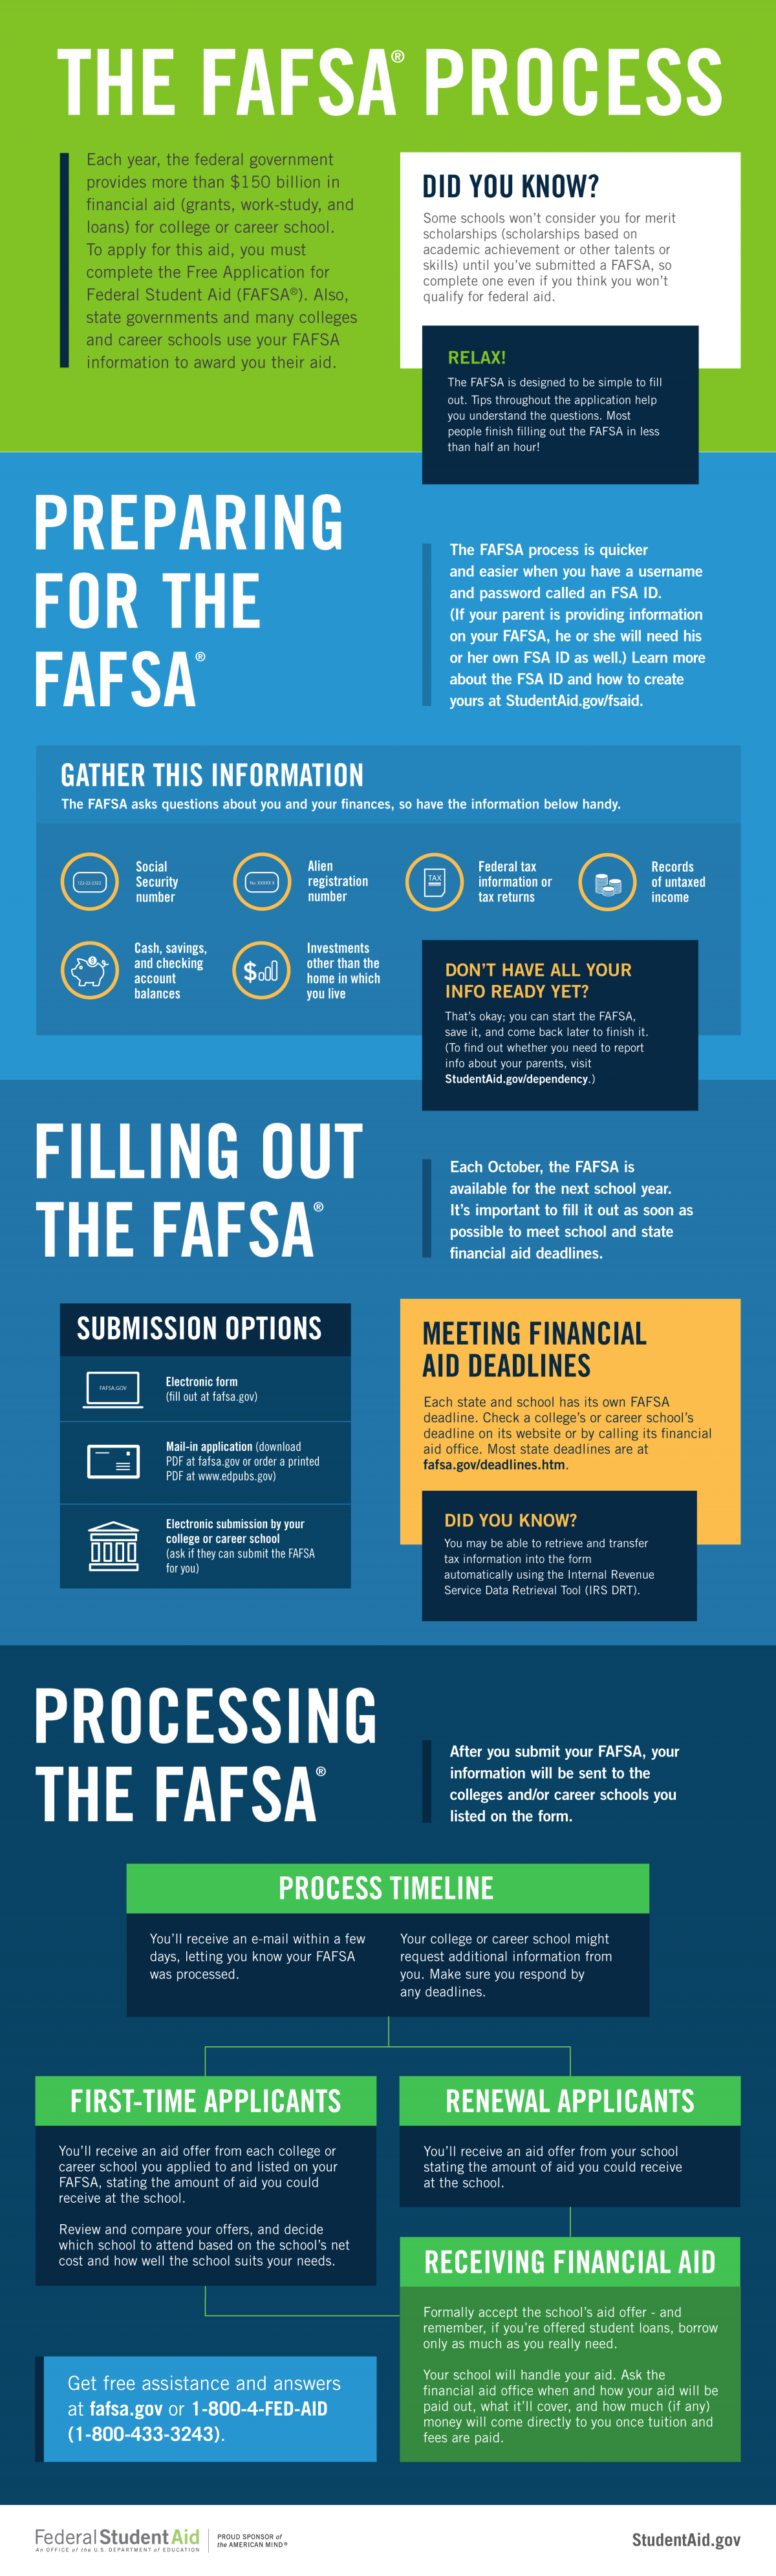 fafsa-process.png